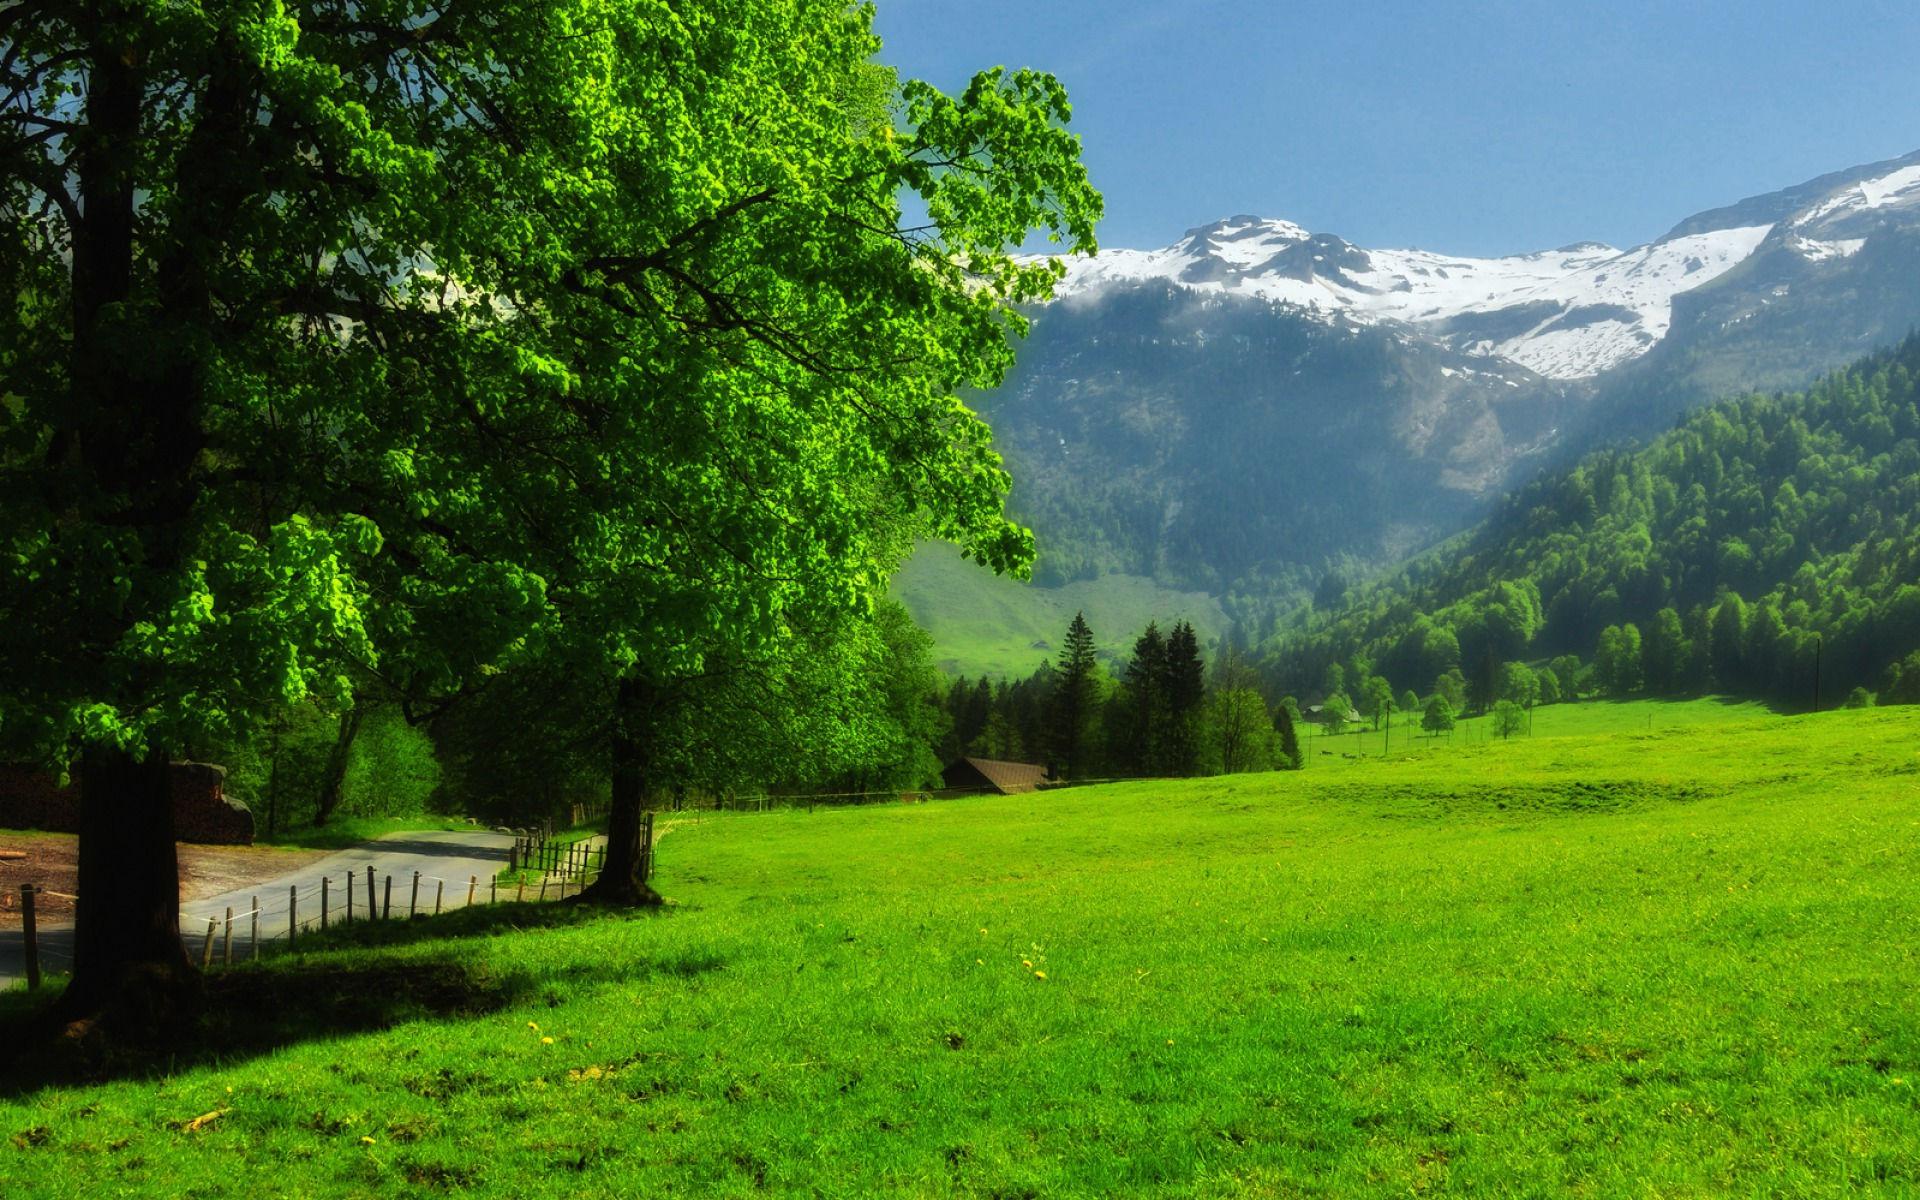 Fonds d 39 cran paysage suisse maximumwallhd for Paysage